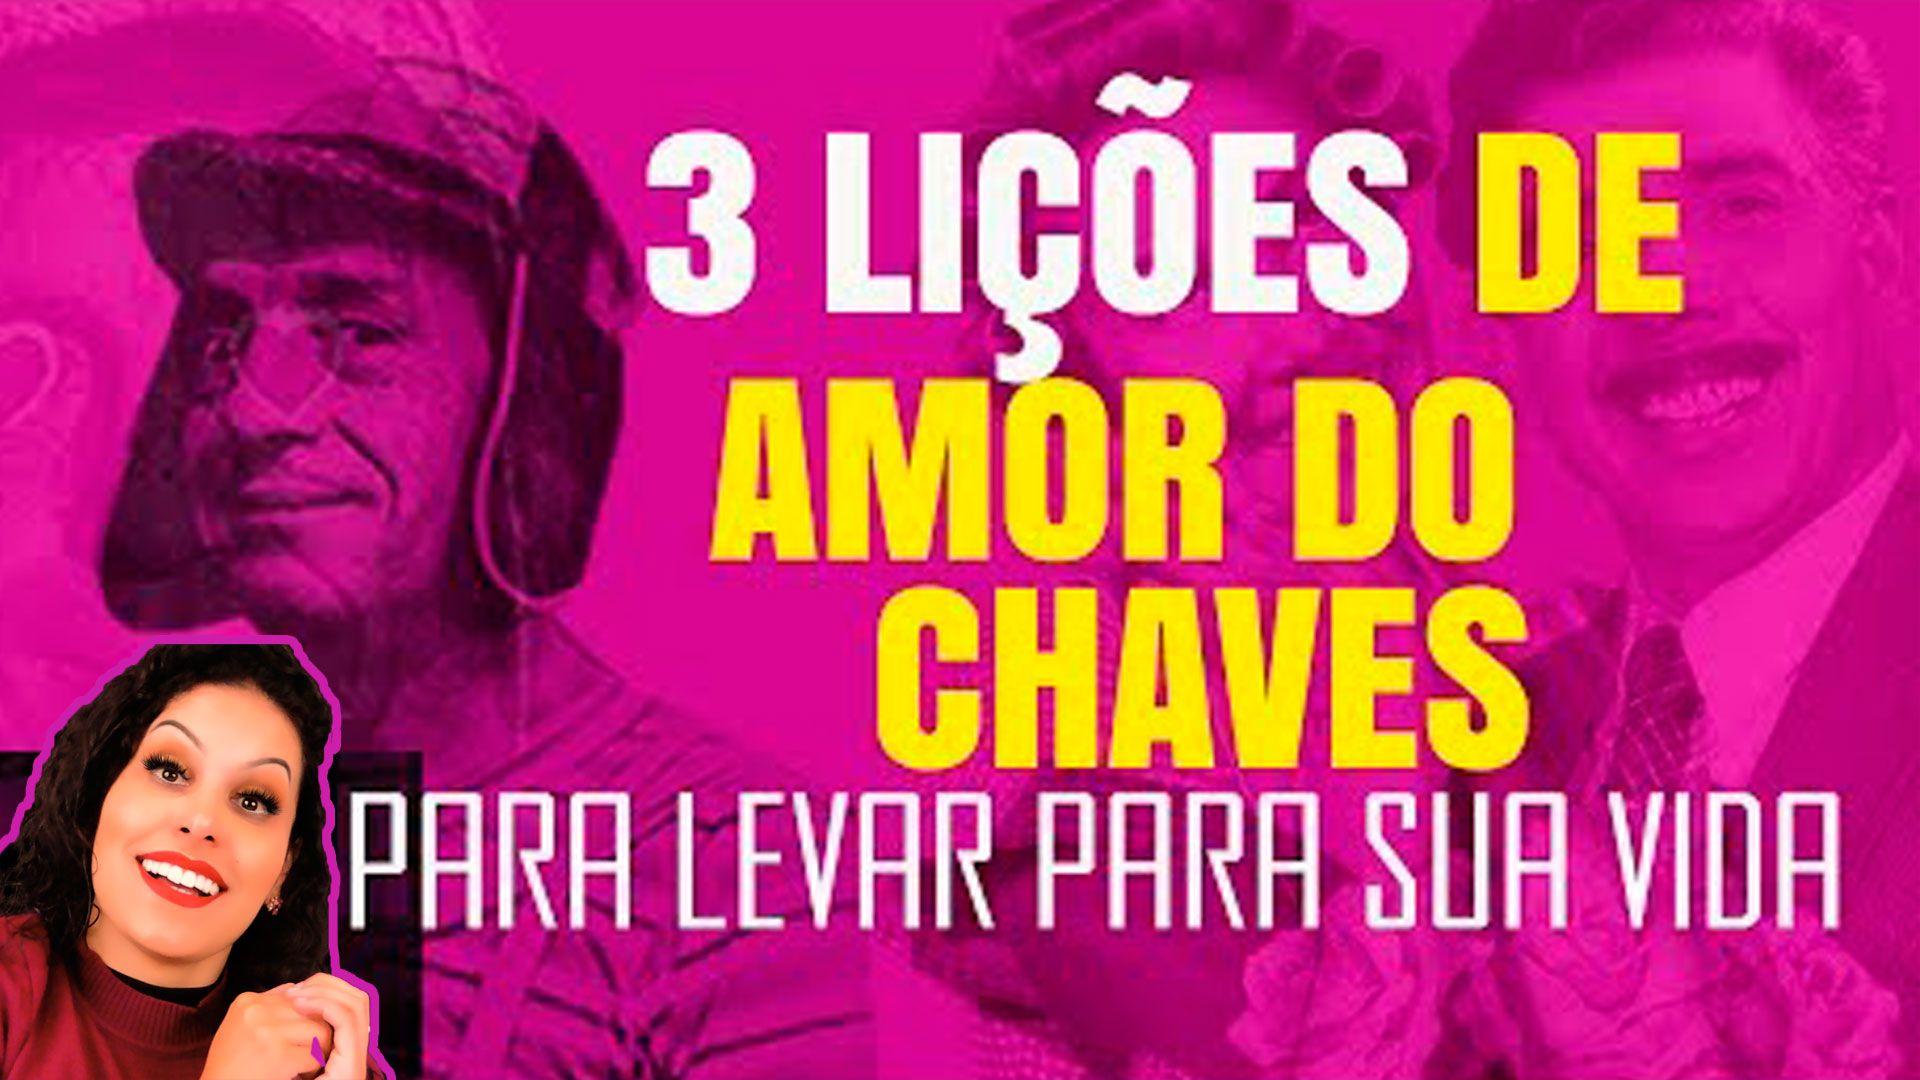 Chaves Donaflorinda Seumadruga Chiquinha Kiko Quico